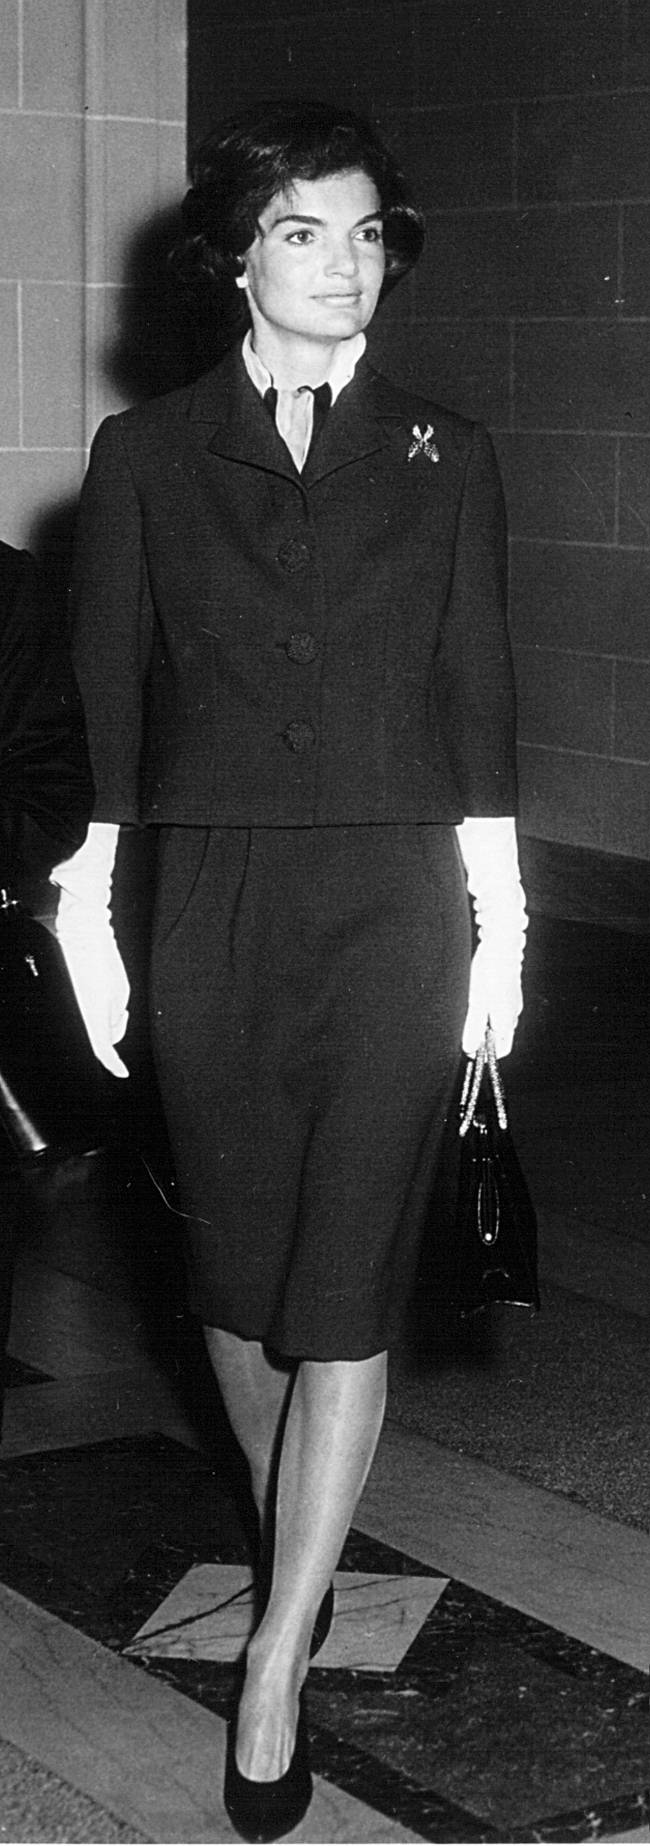 Jackie costumava combinar luvas curtas com blazer e saia(Photo by National Archive/Newsmakers)